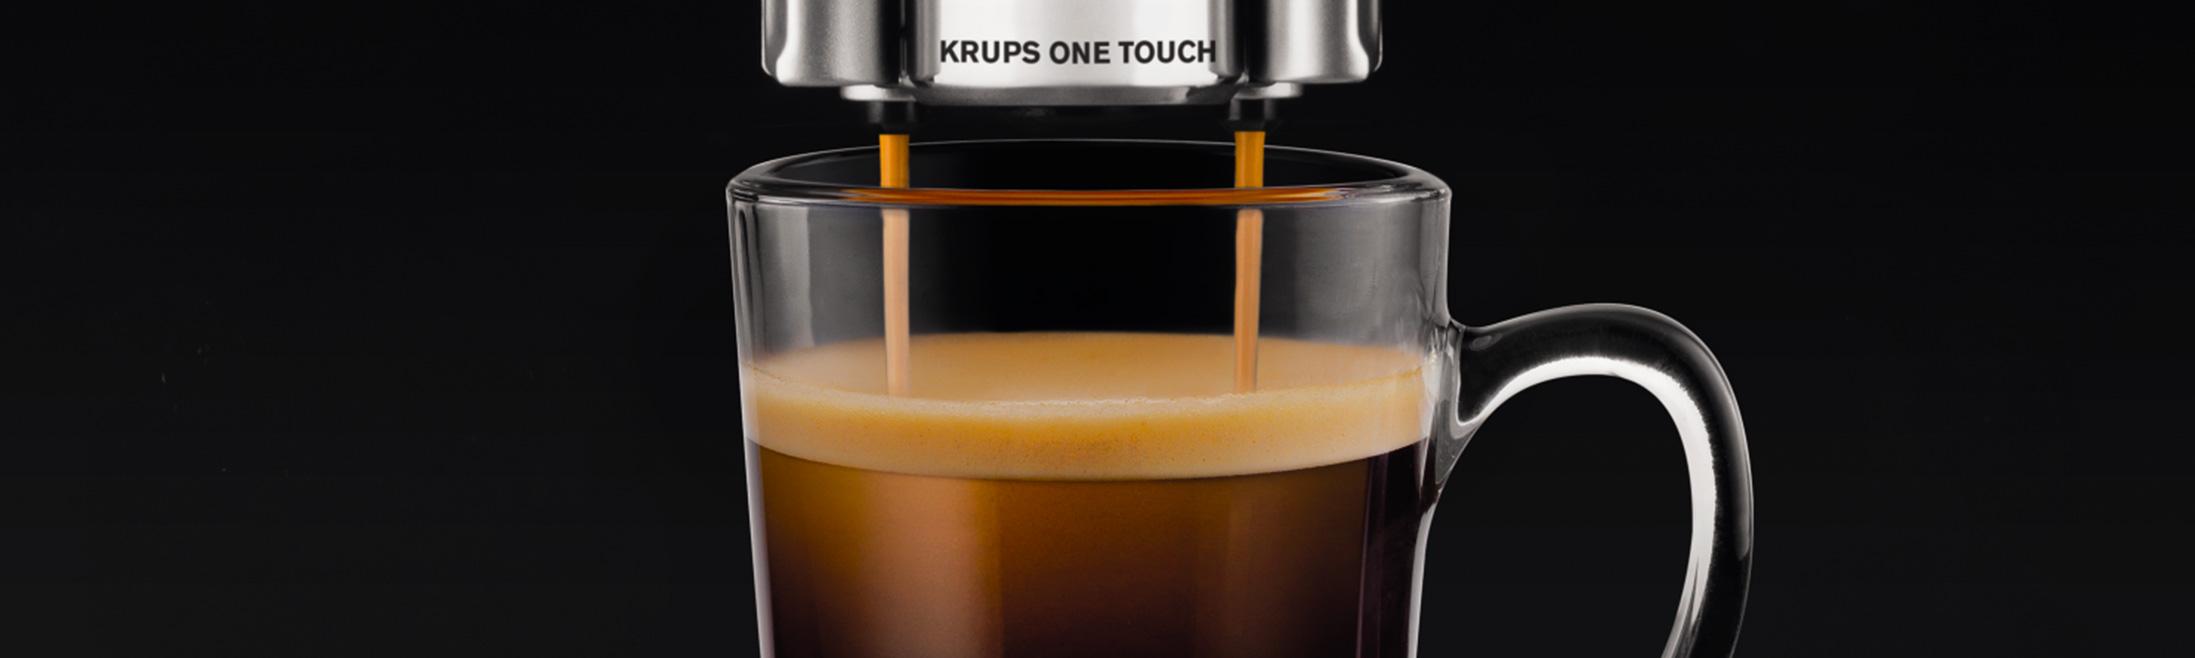 History Of Kitchen Appliances Kitchen Appliances Krups